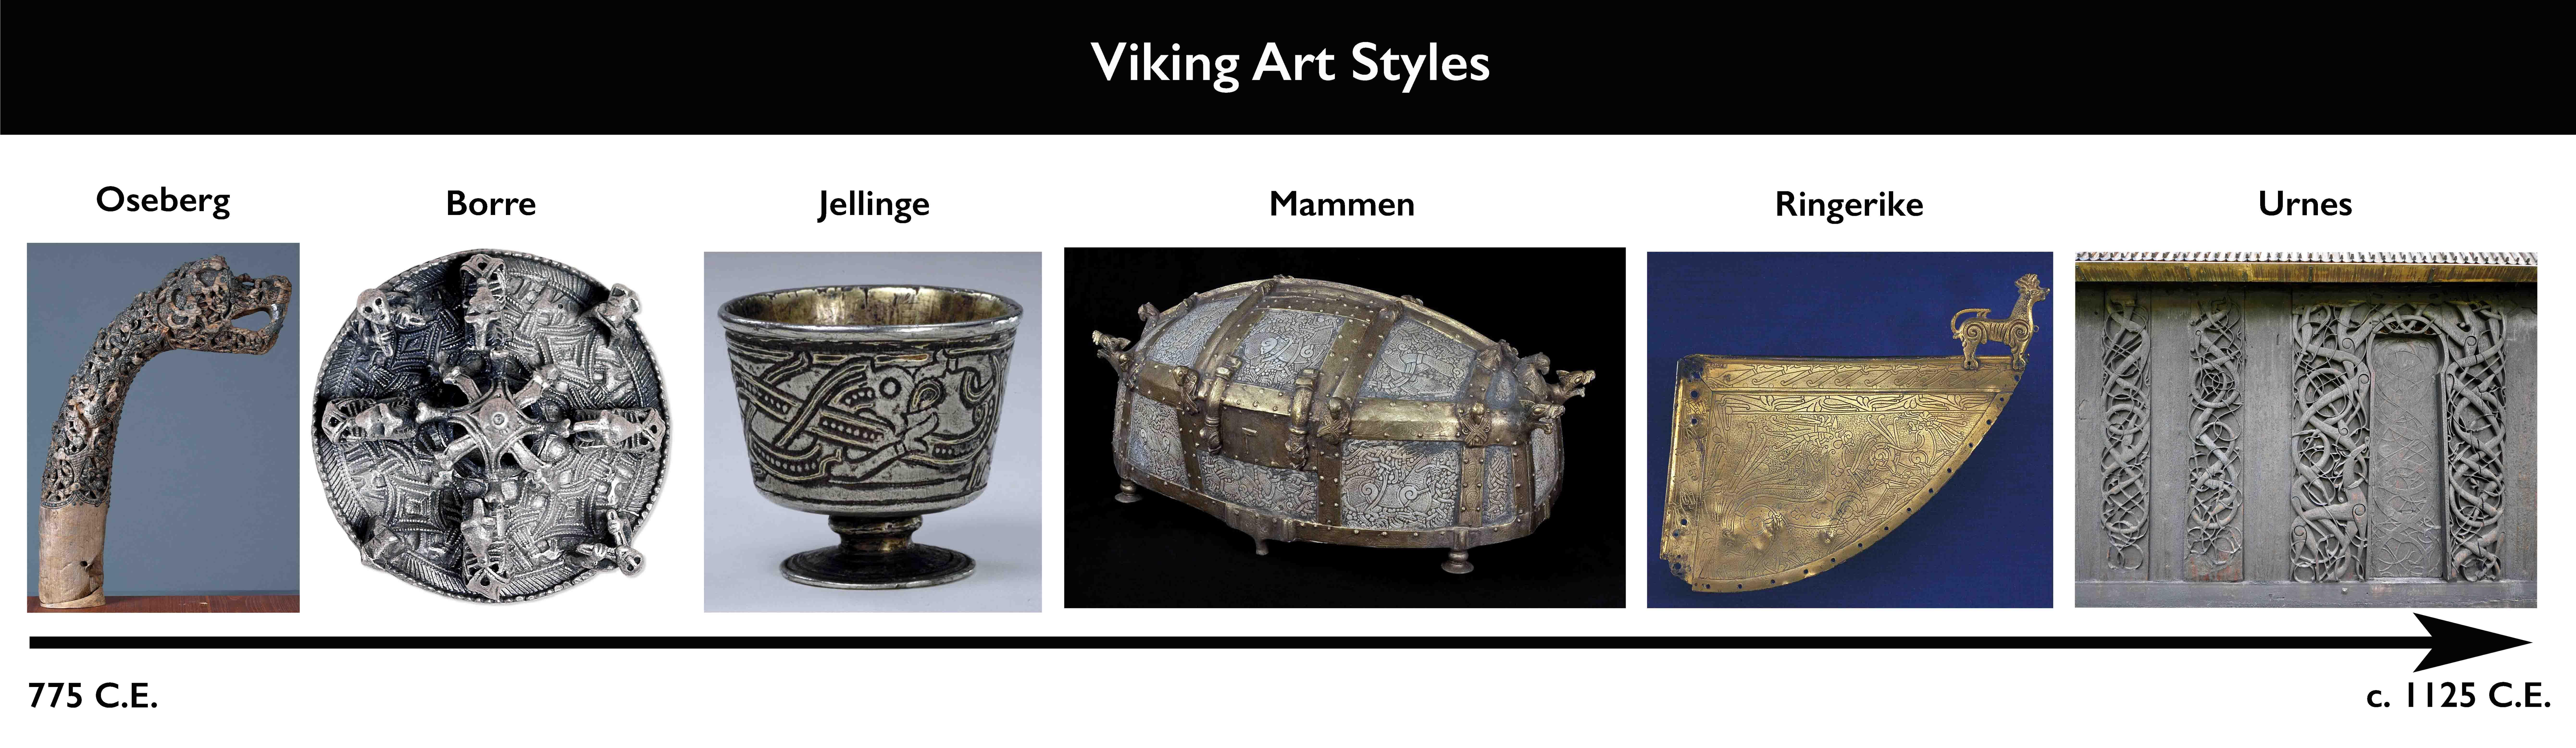 The six Viking styles